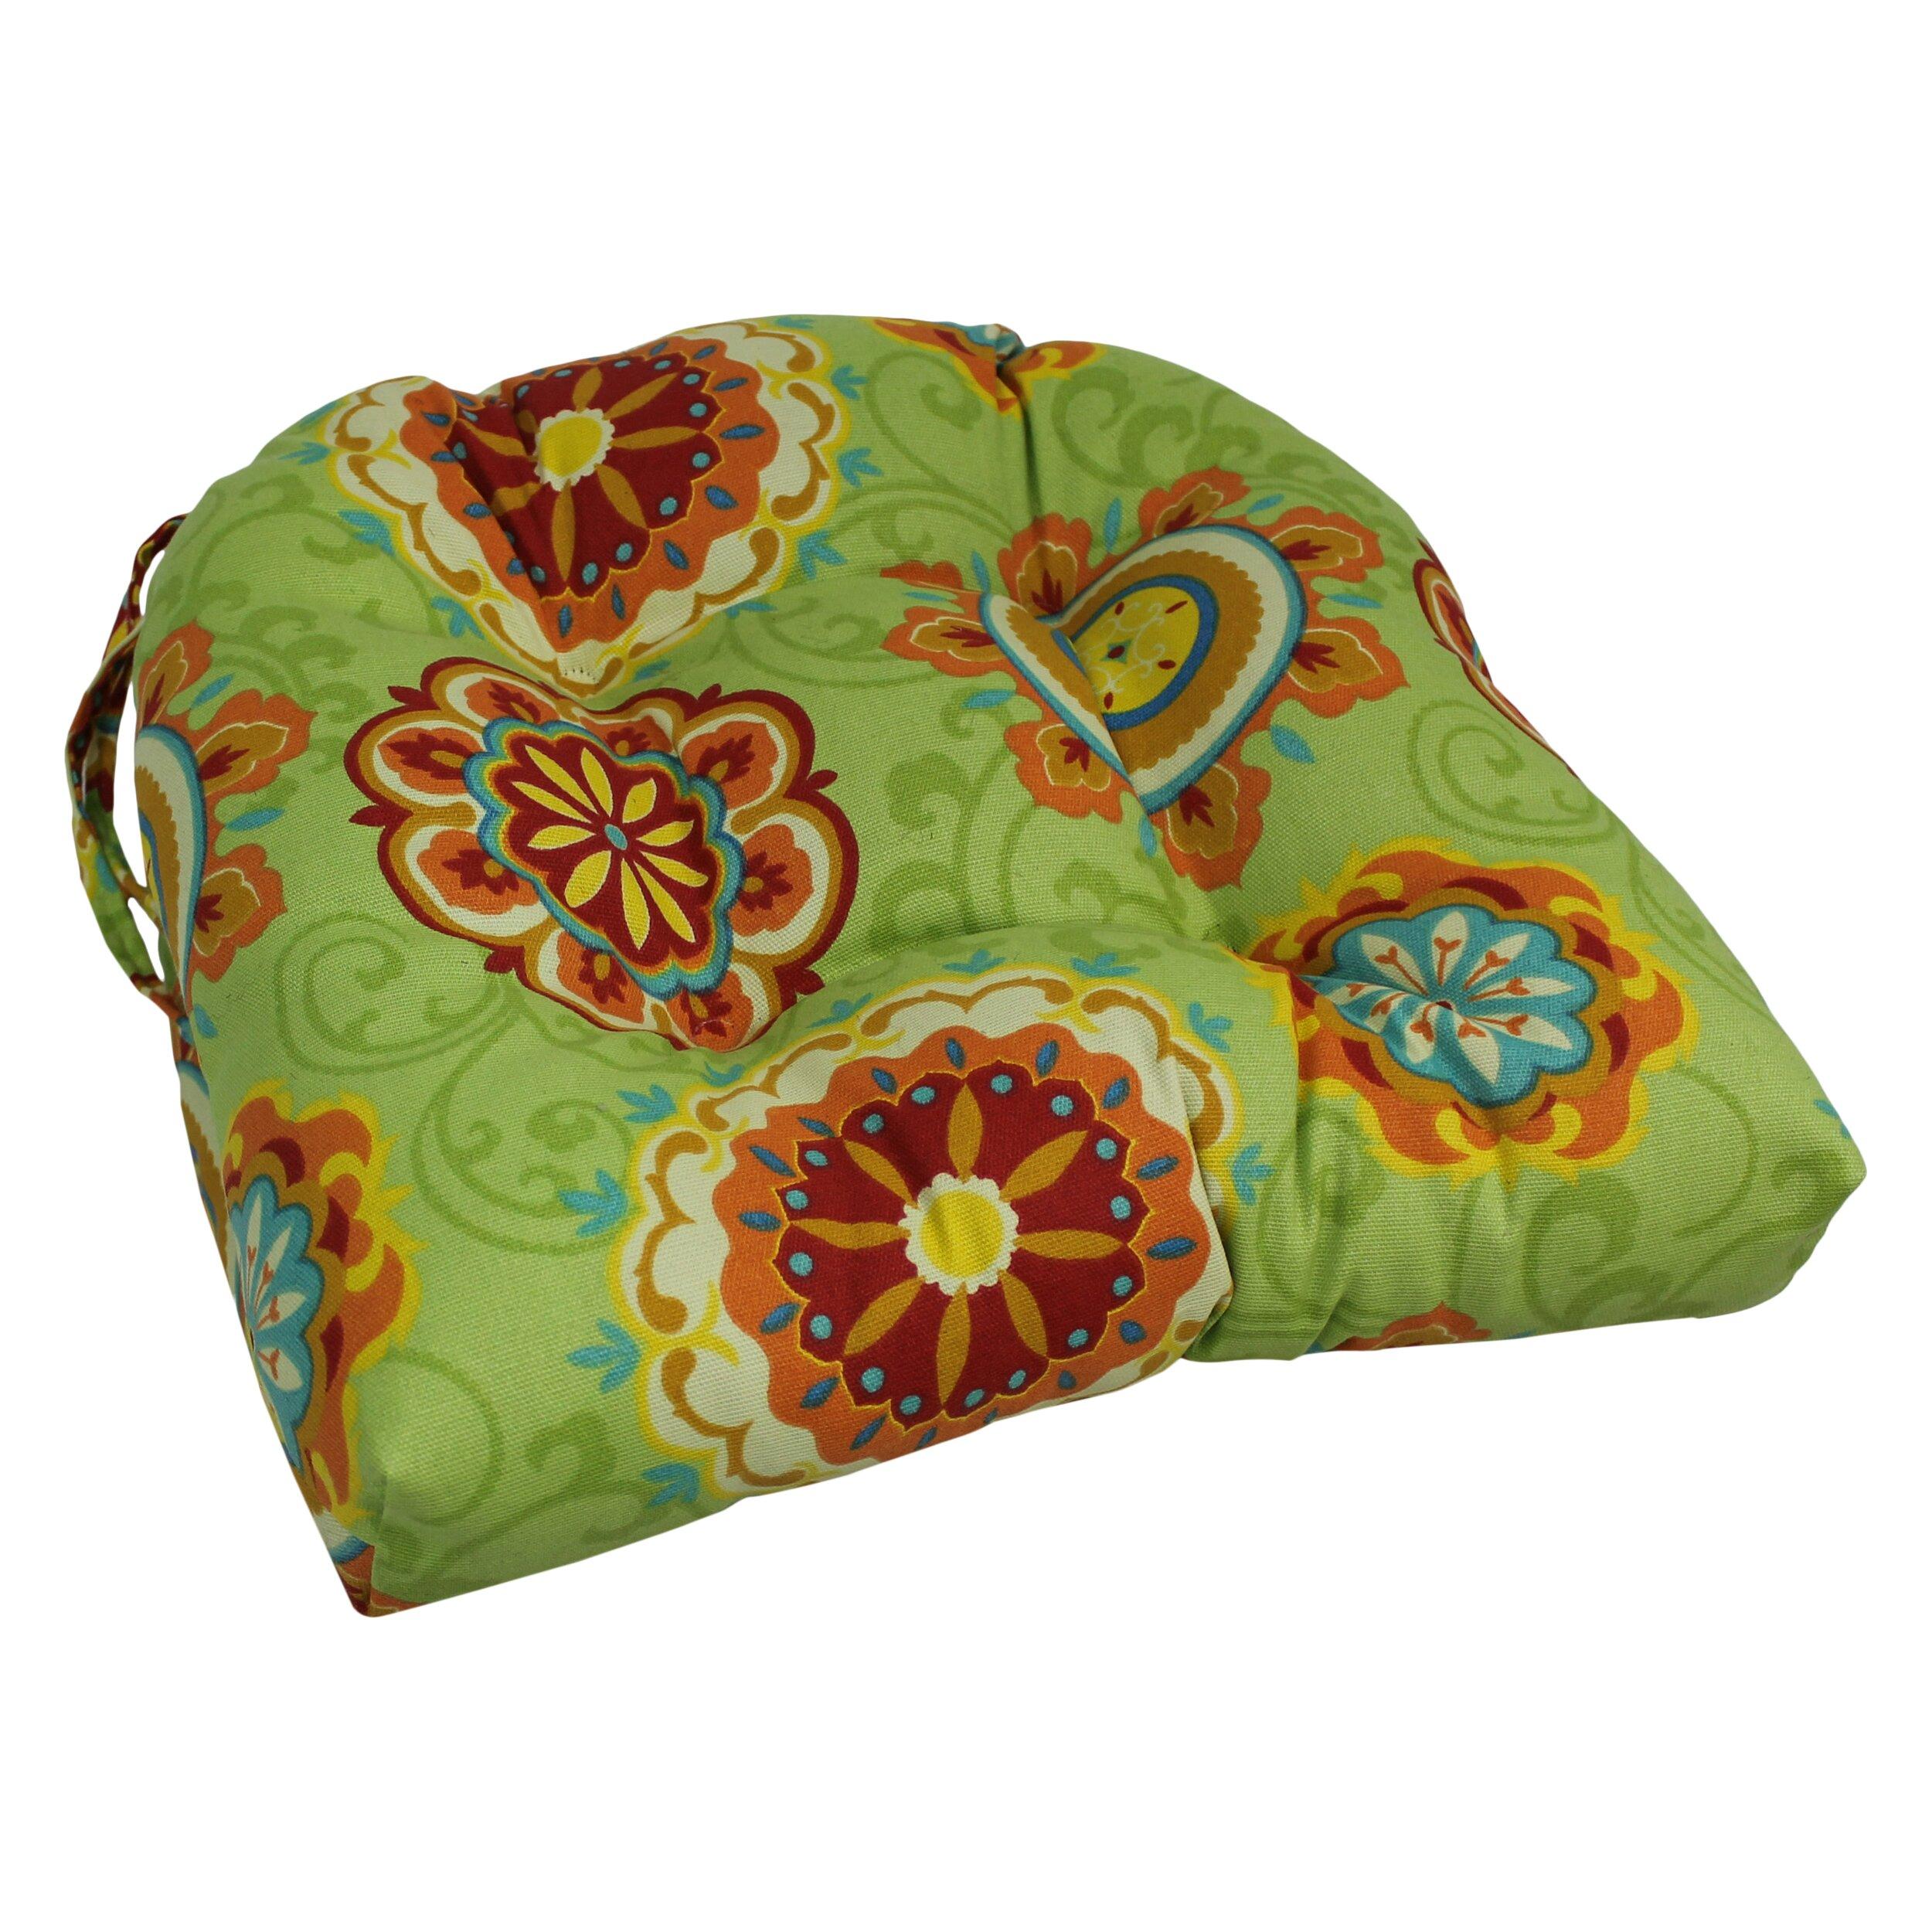 Make Wicker Chair Cushions All%bweather%buv%bresistant%bu Shape%bpatio%bchair%bcushion